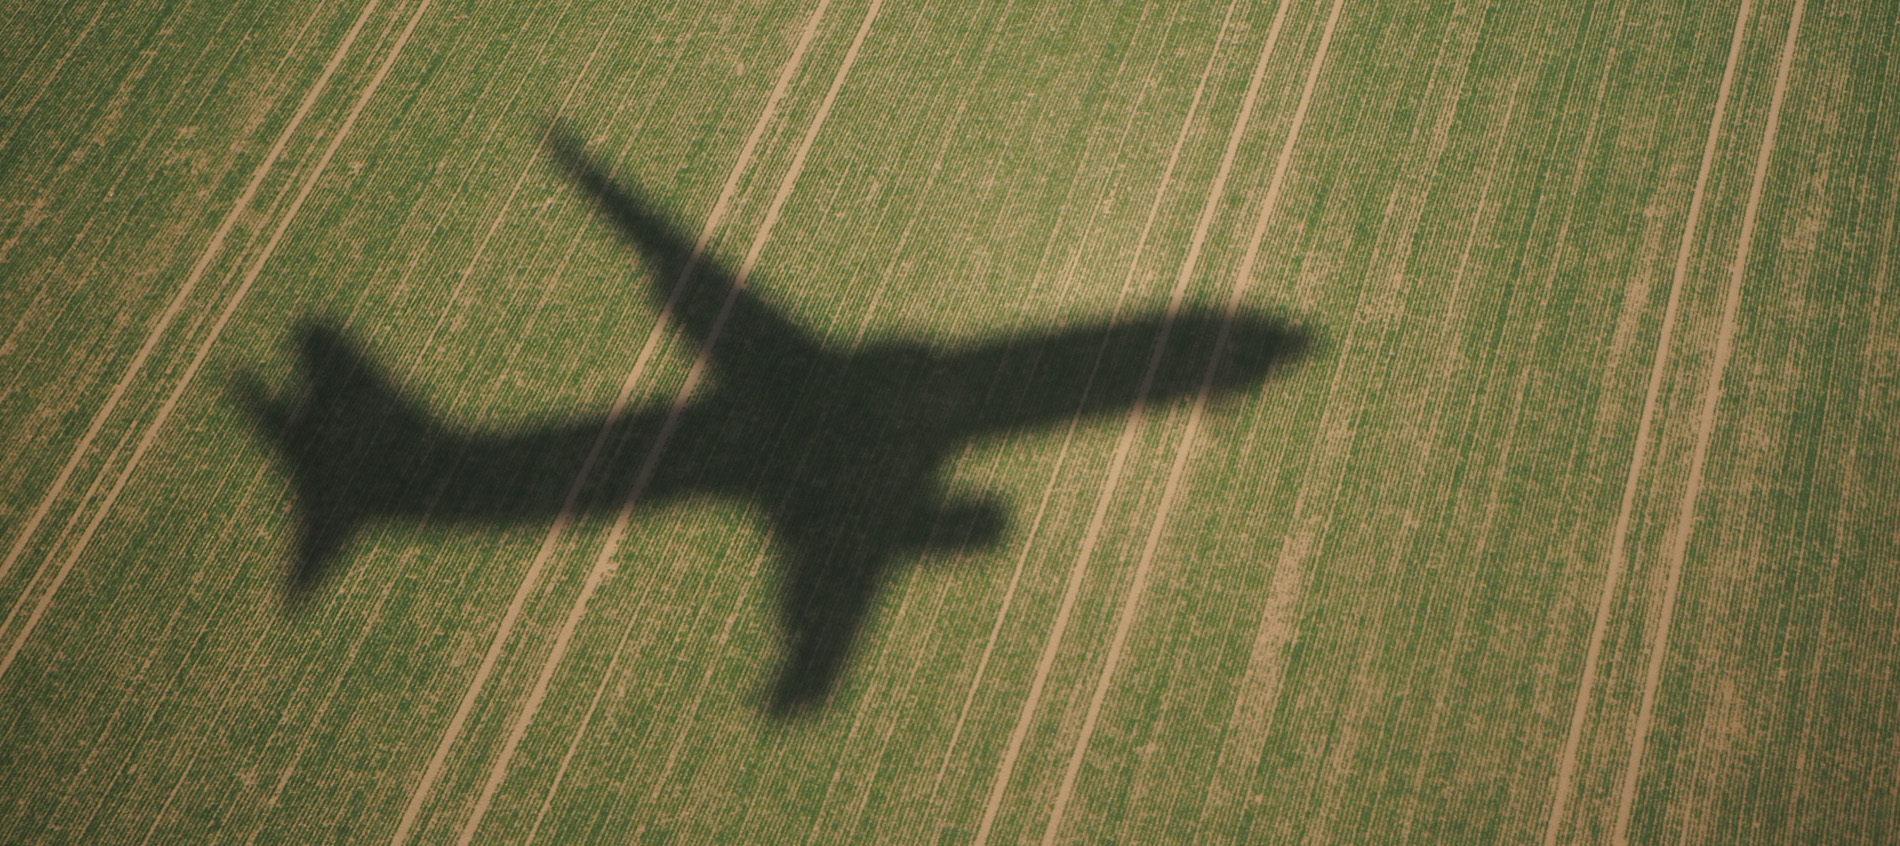 CAAi and FlyZero announce partnership on zero-carbon emission flight